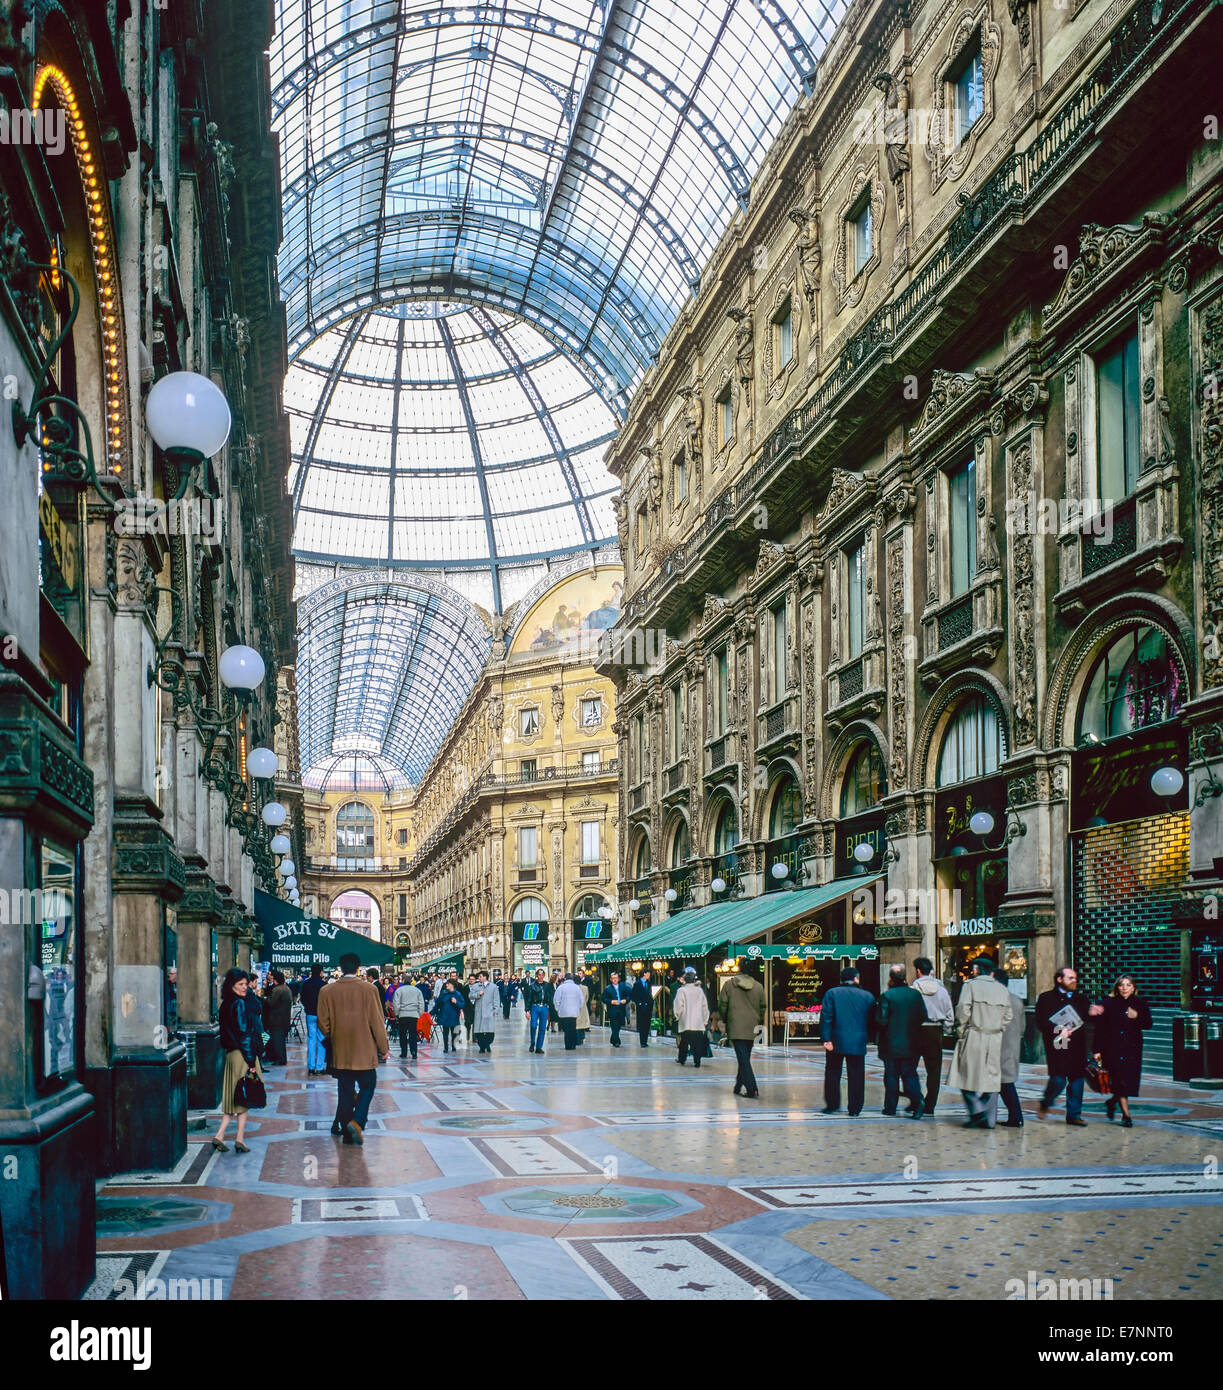 Galleria Vittorio Emanuele II shopping arcade Milan Lombardy Italy - Stock Image